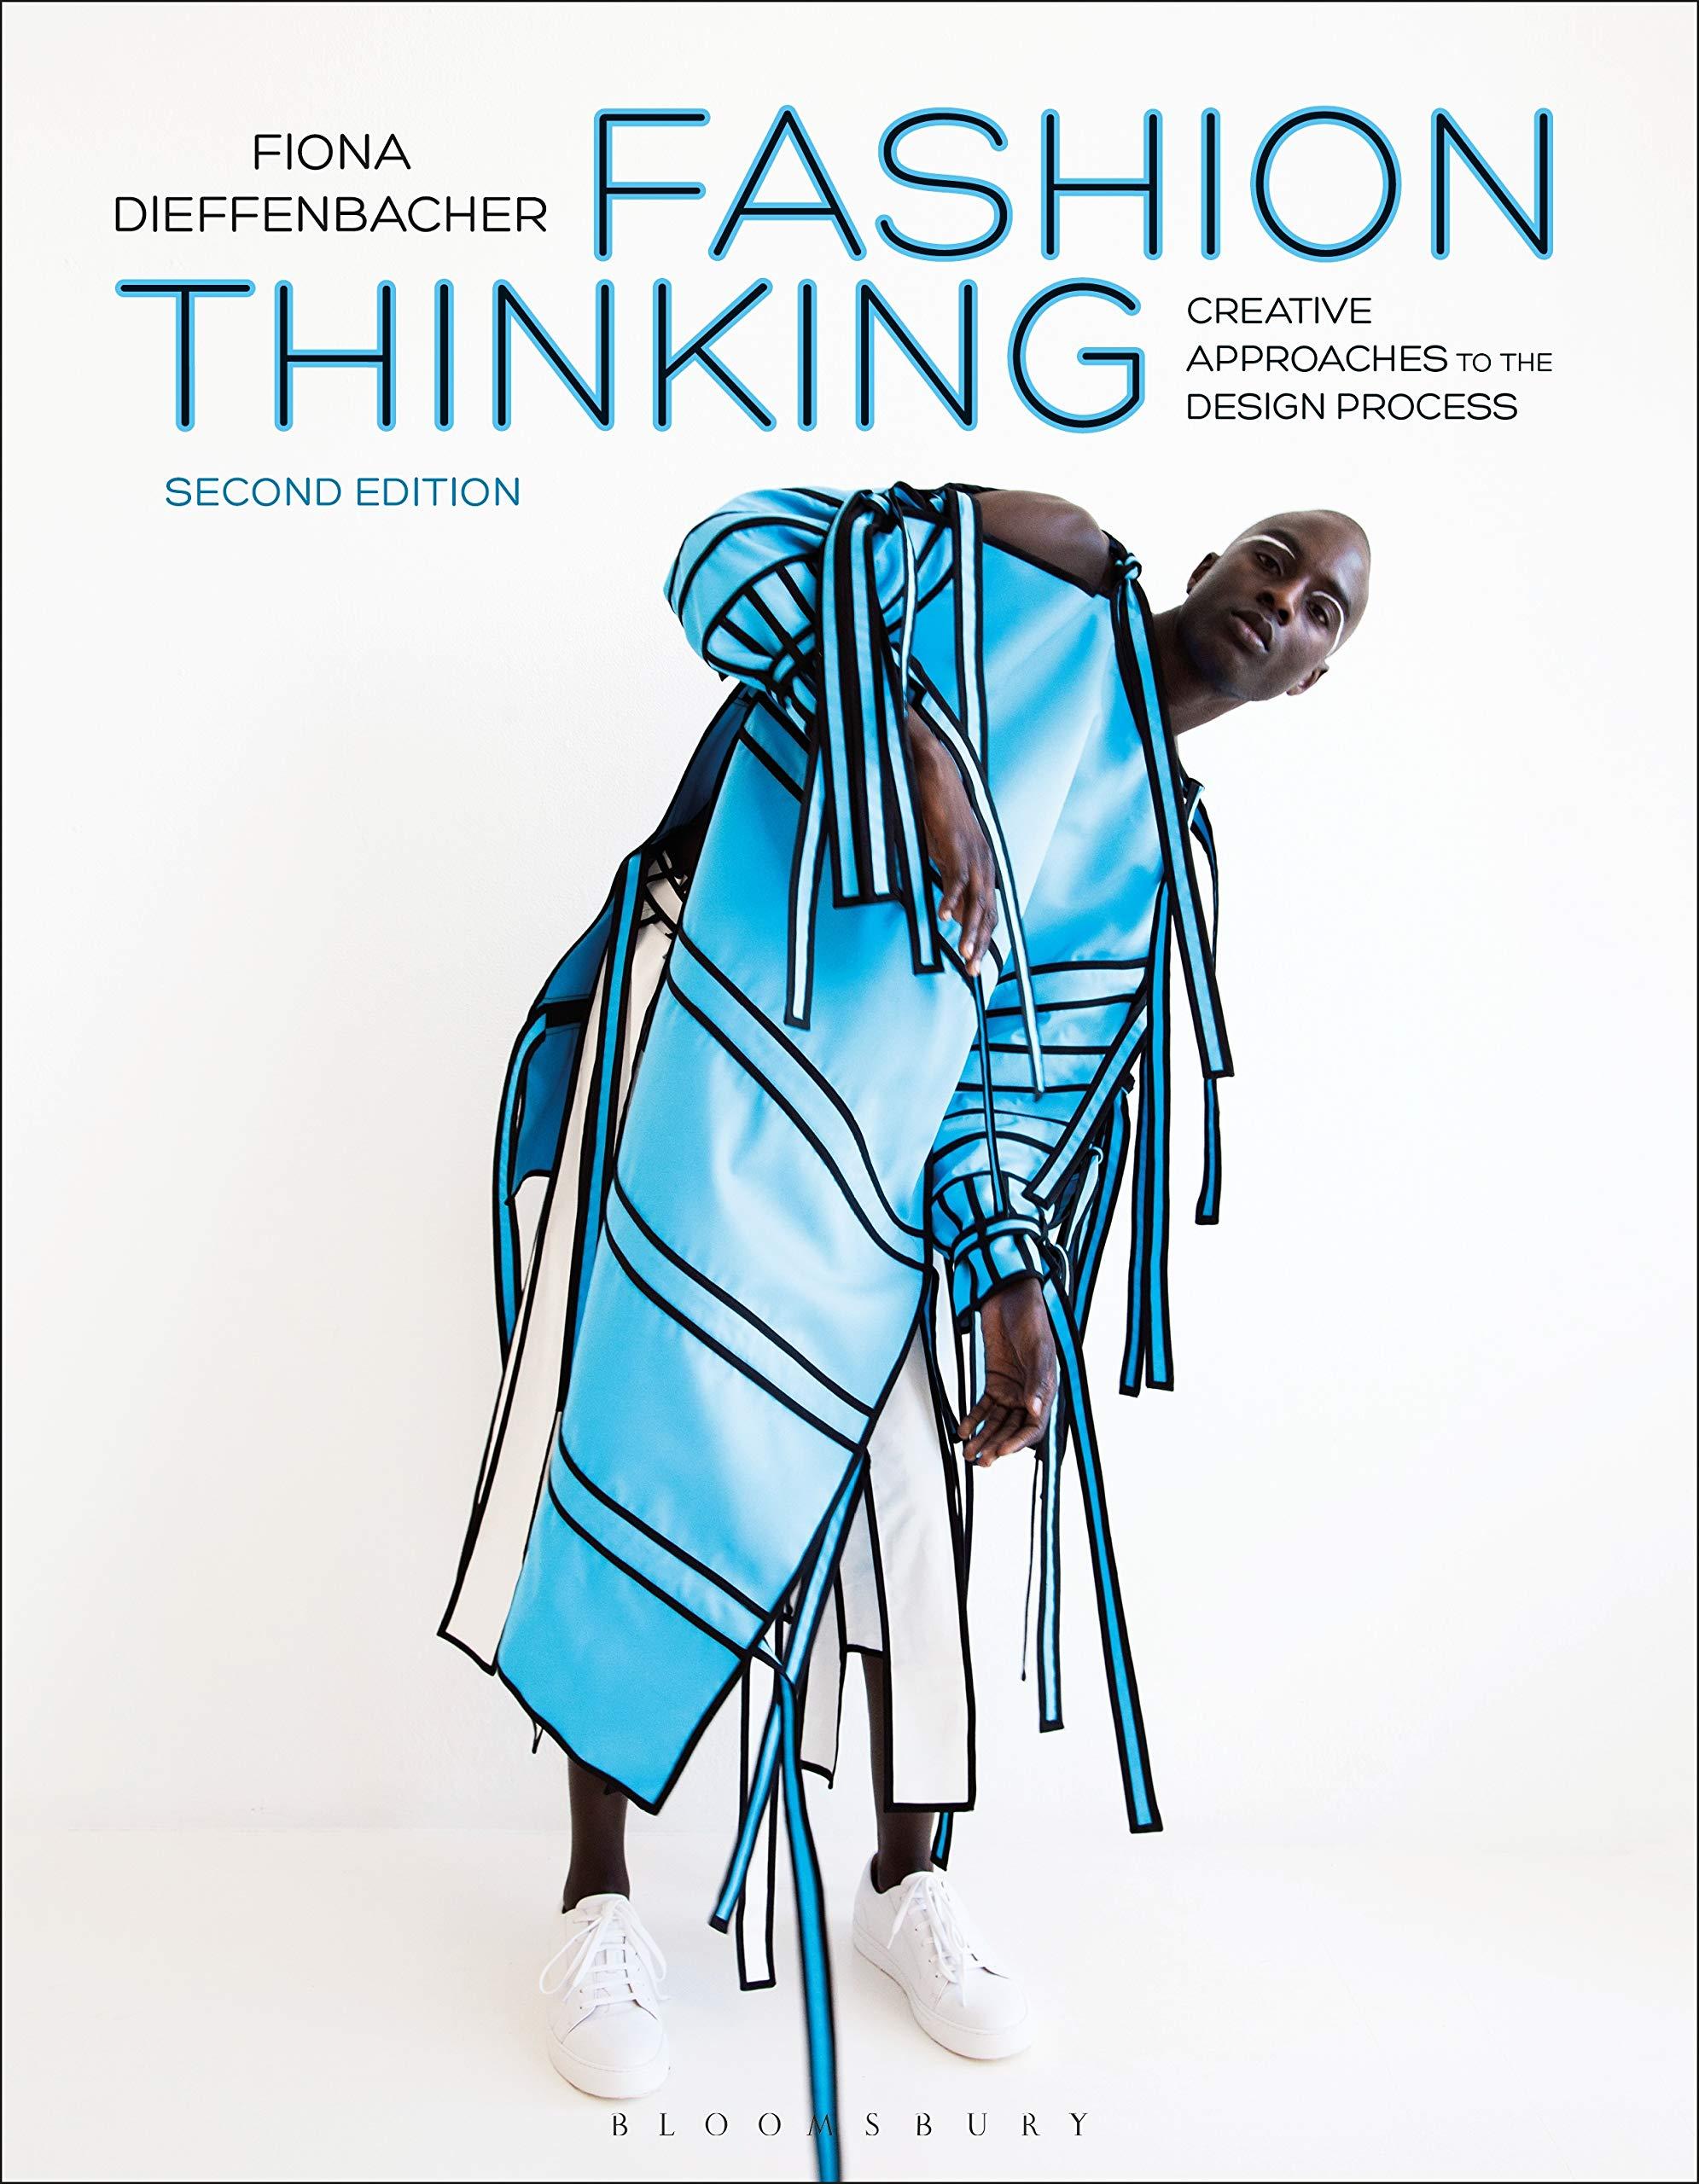 Fashion Thinking Creative Approaches To The Design Process Dieffenbacher Fiona 9781350082755 Amazon Com Books